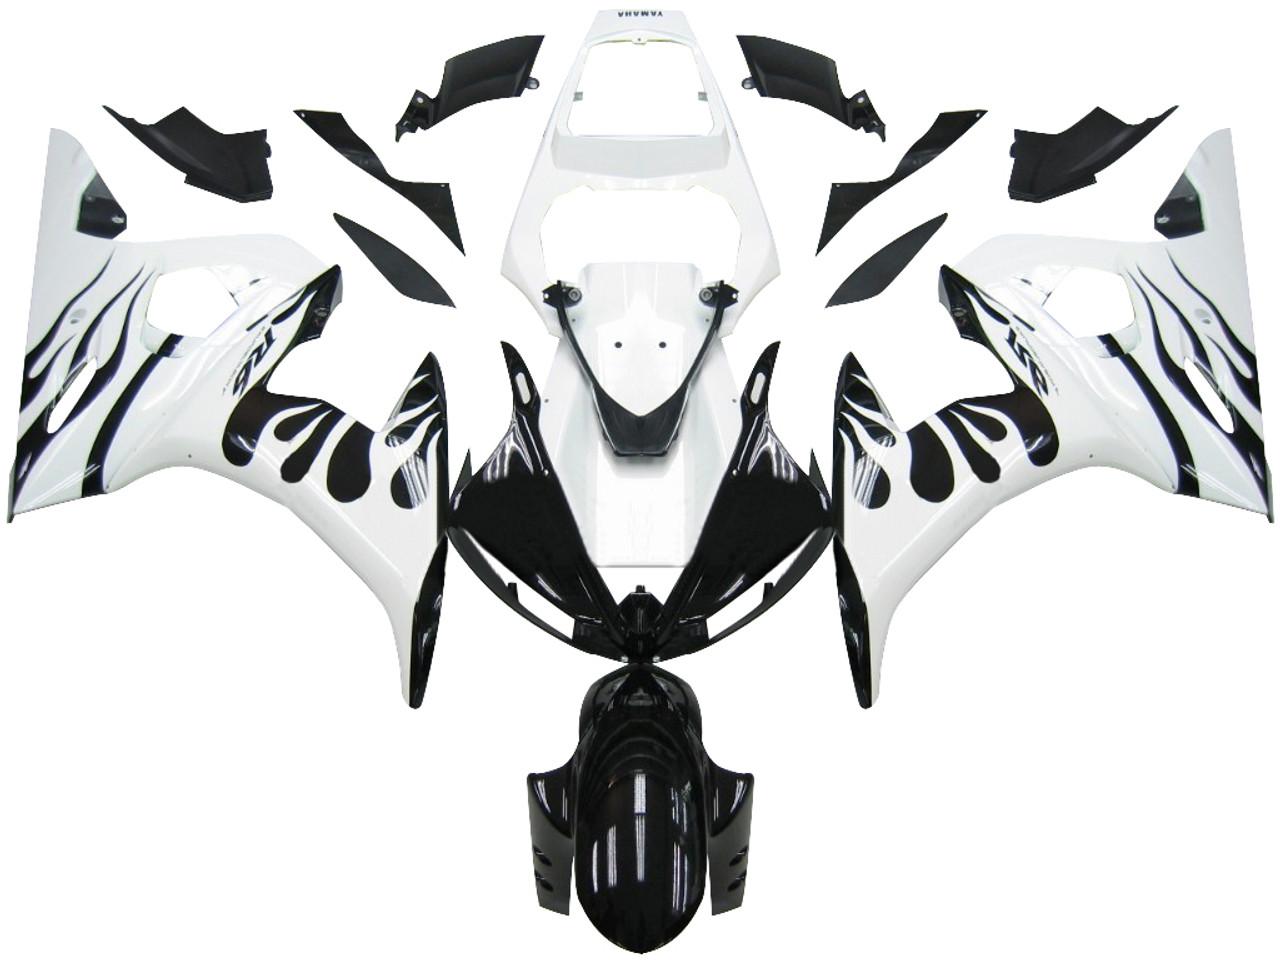 Fairings Yamaha YZF-R6 White Flame Black R6 Racing (2003-2005)